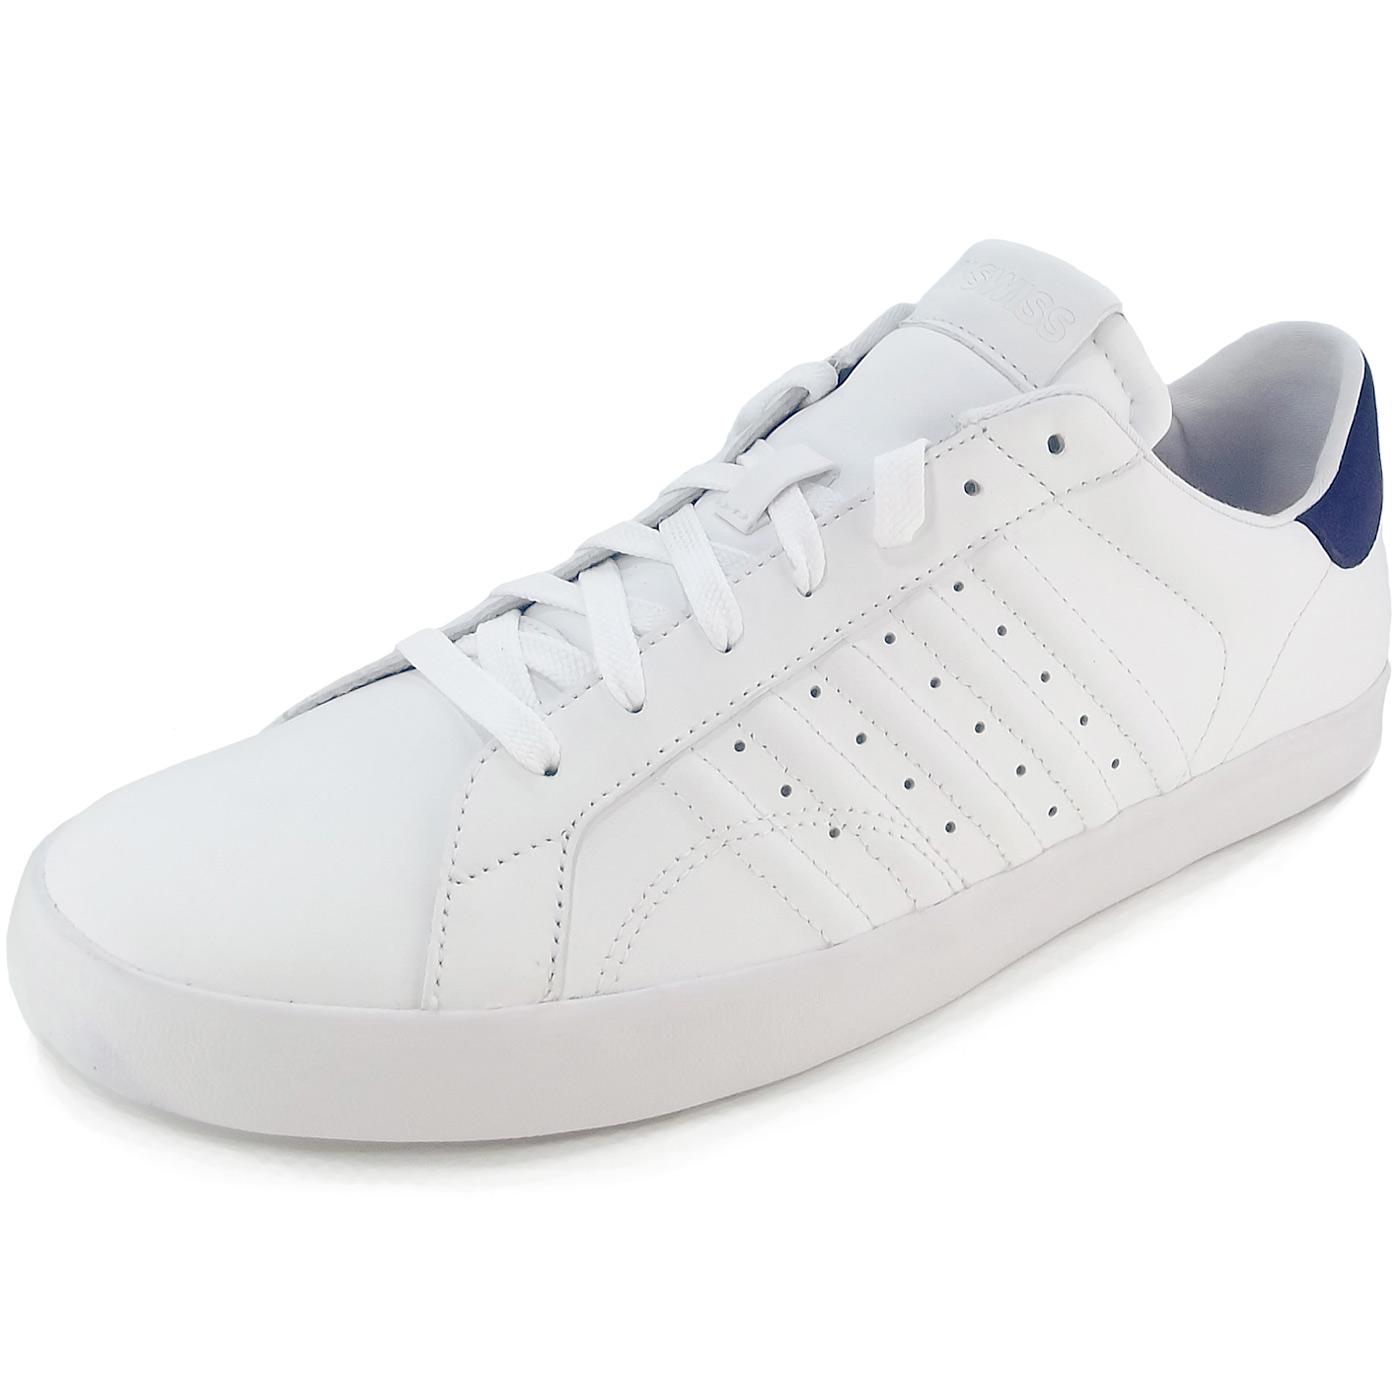 low priced 36f1b d0ca0 K-Swiss Belmont Men Sneakers white/navy